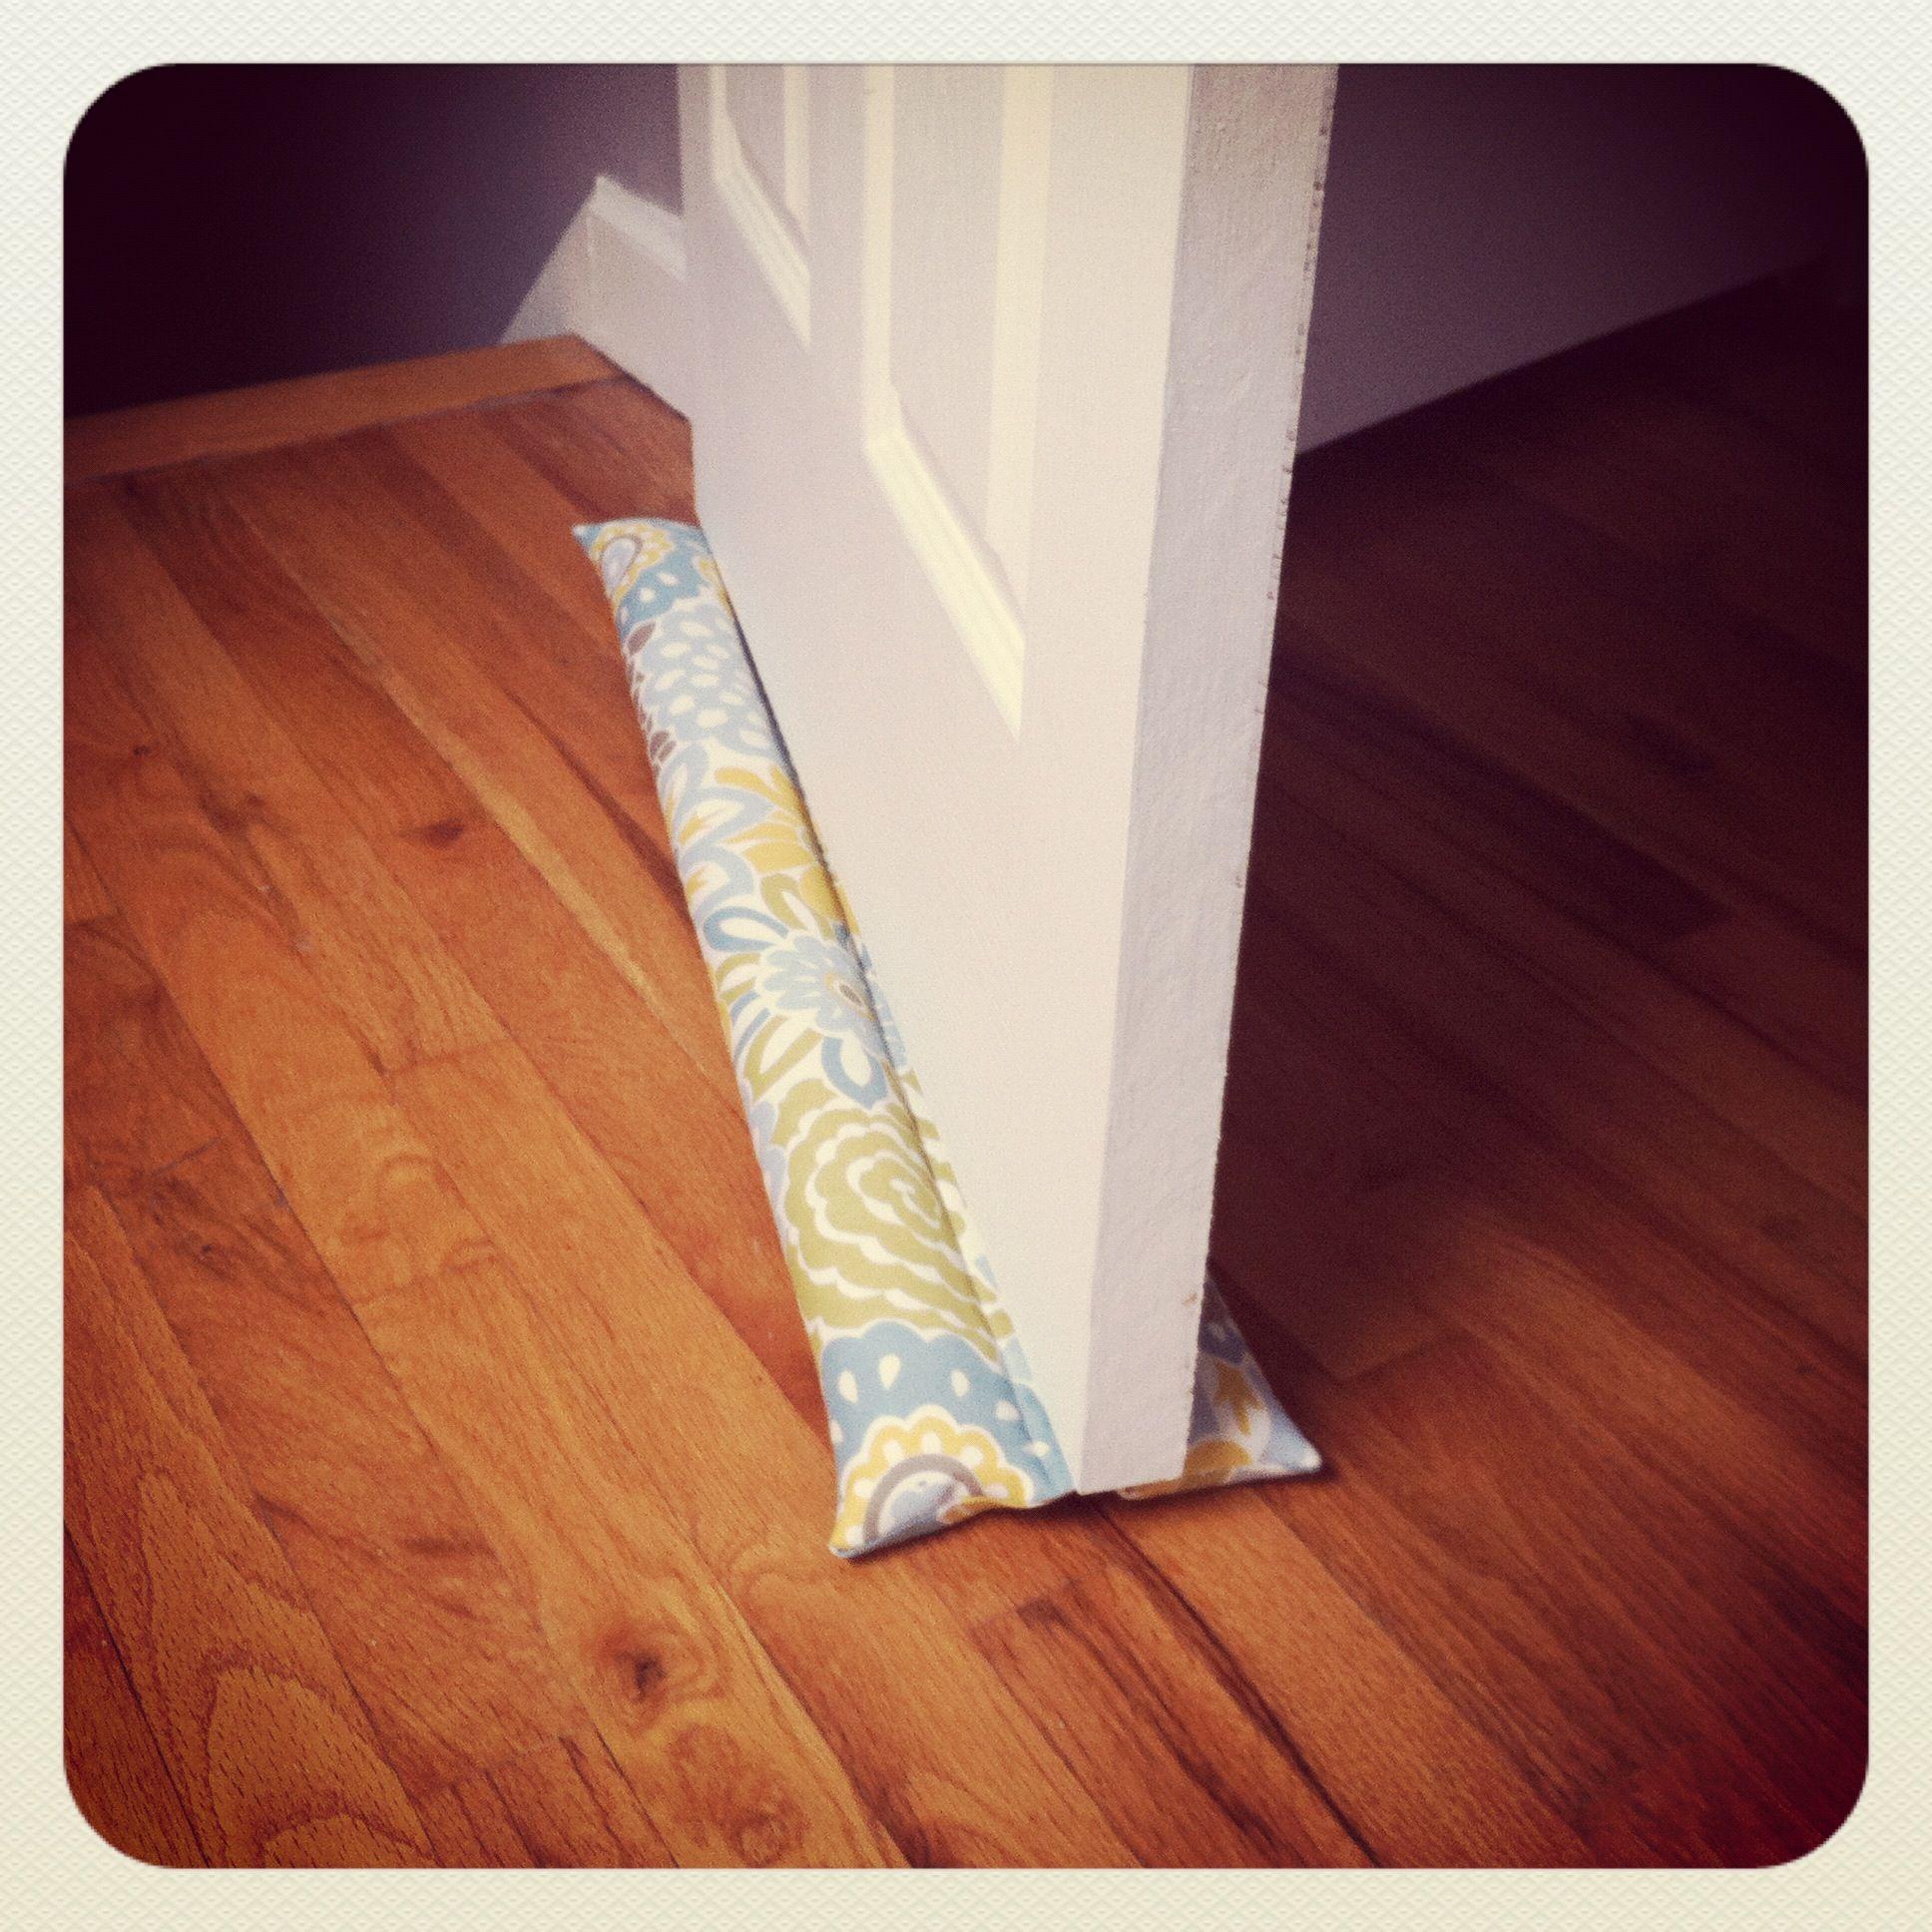 double-sided #DIY door draft stopper